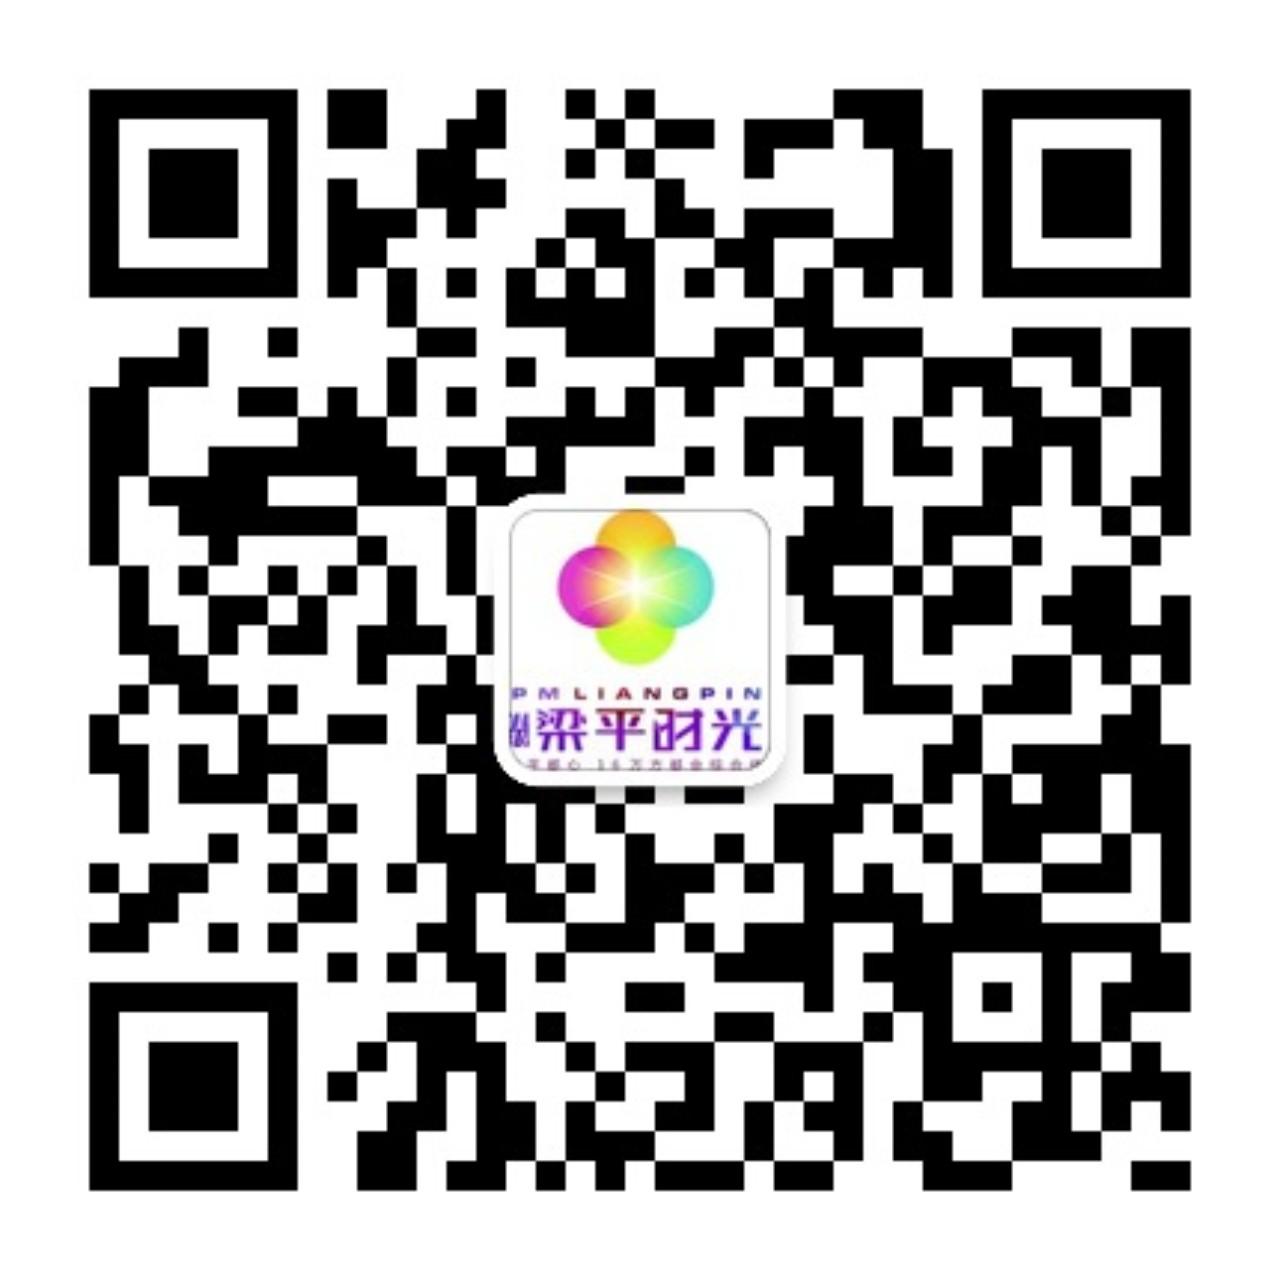 微信号:lpsg53888666